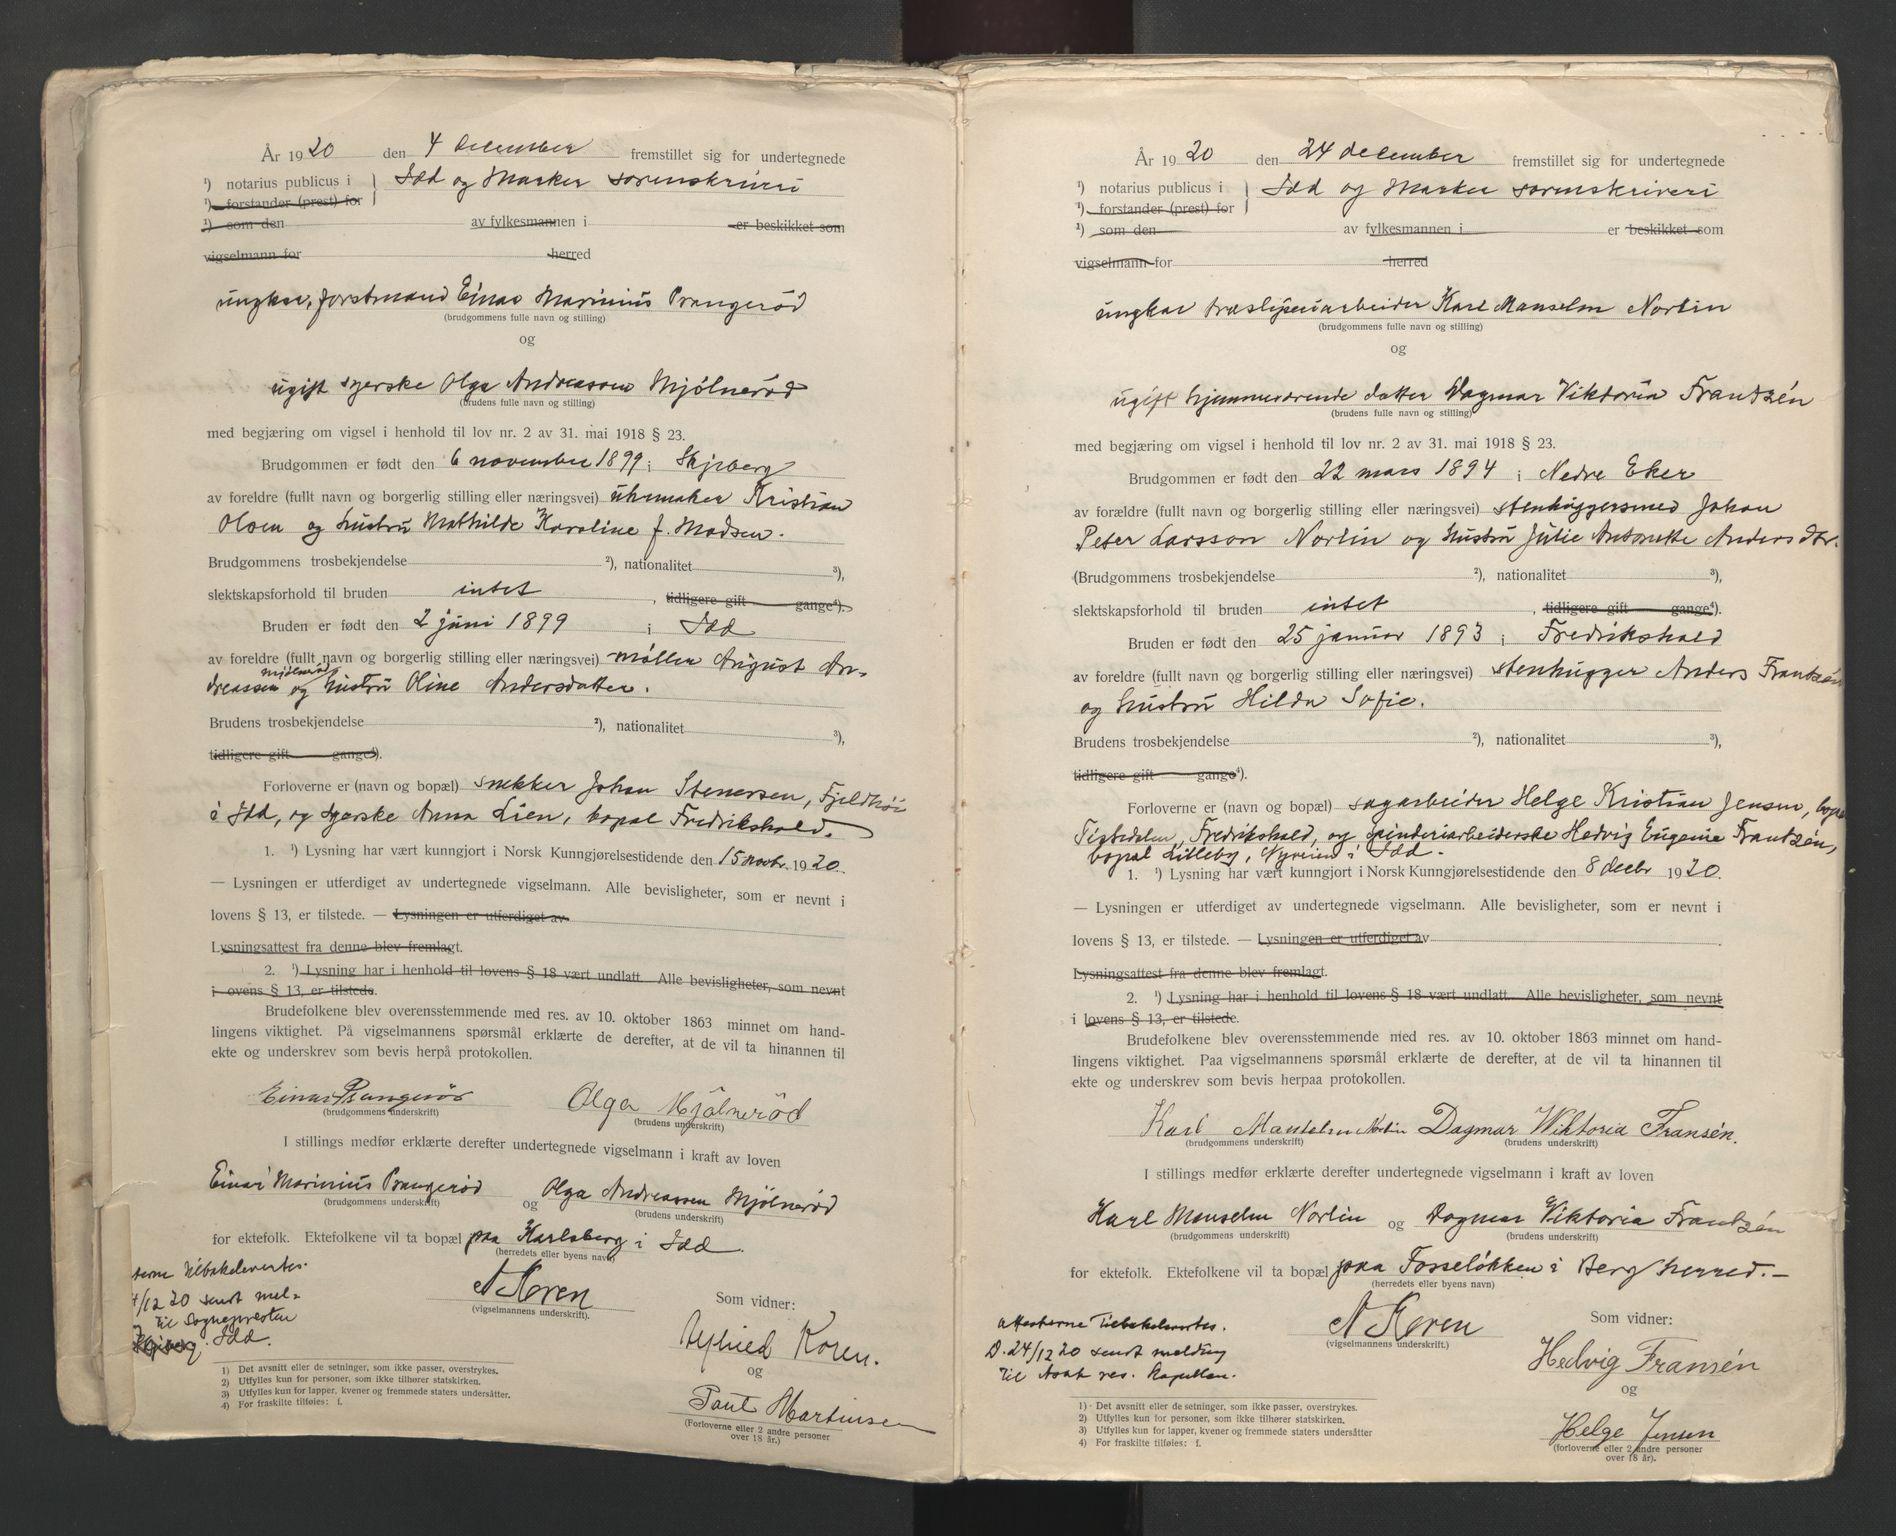 SAO, Idd og Marker sorenskriveri, L/Lc/L0001: Vigselsbøker, 1920-1942, s. 6